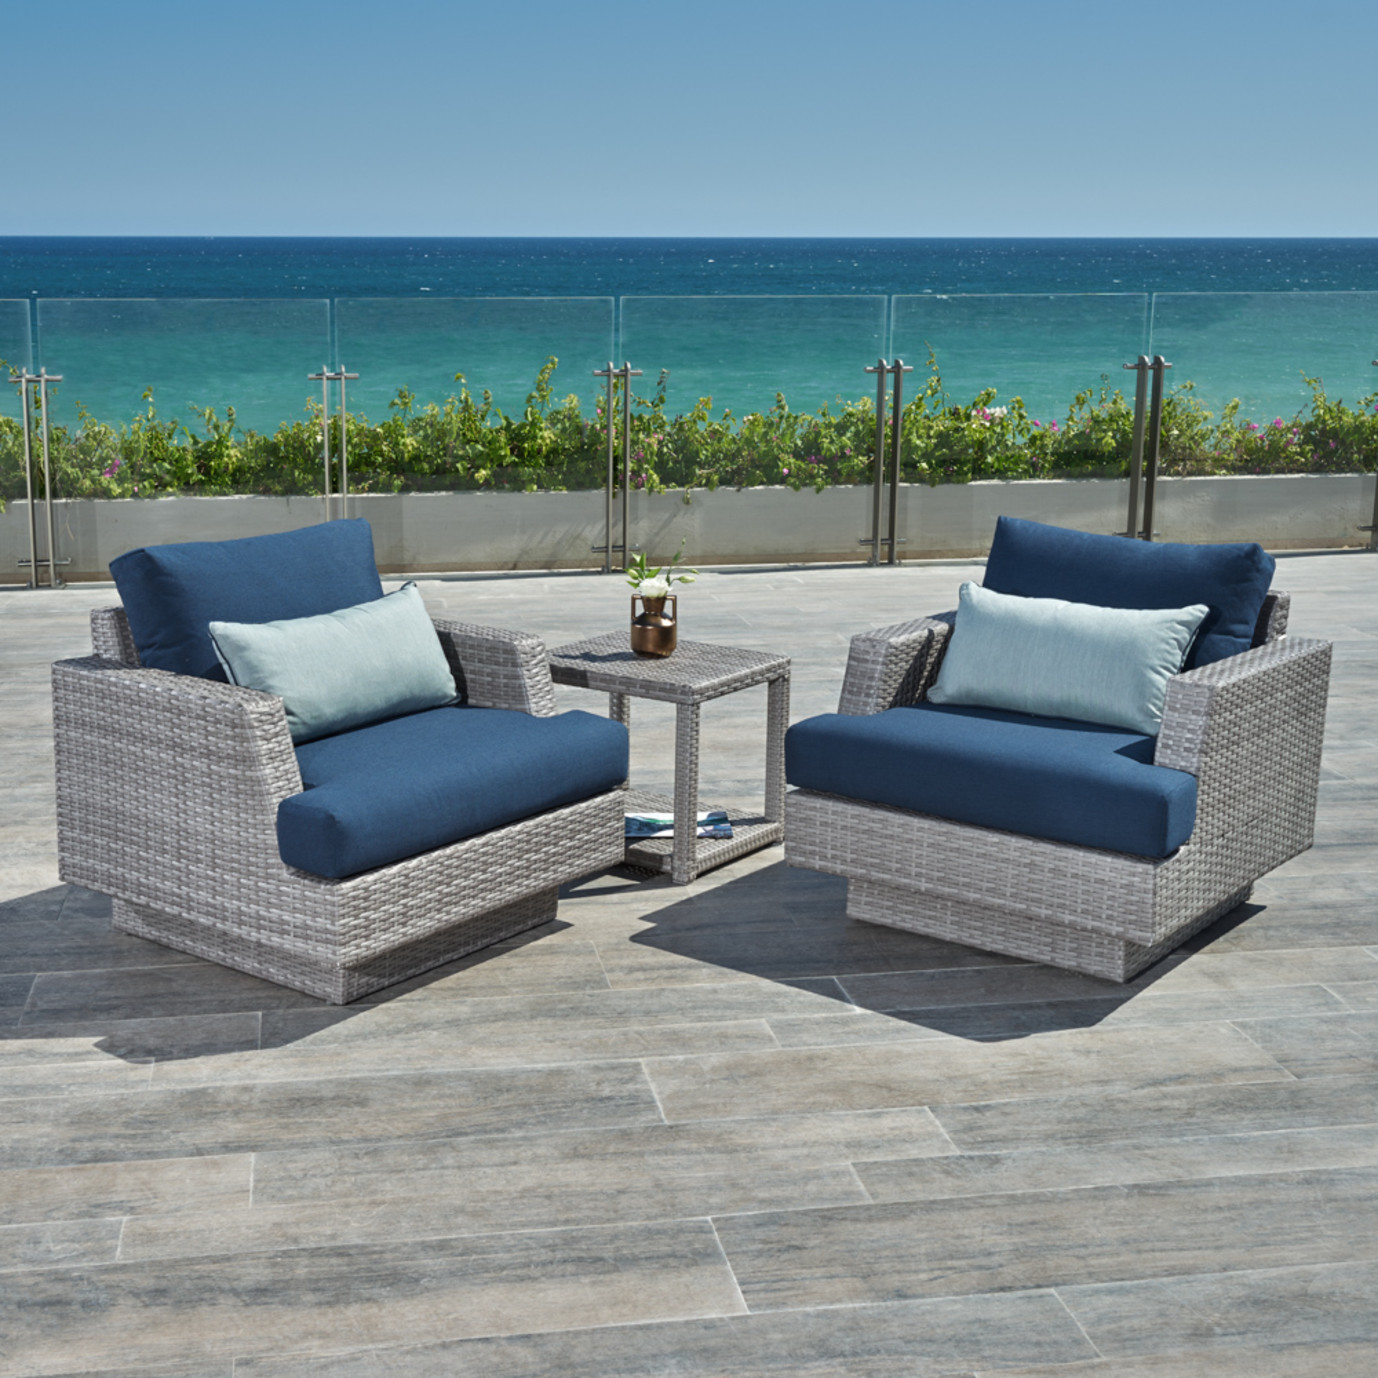 Portofino™ Comfort Club Chairs with Side Table - Laguna Blue